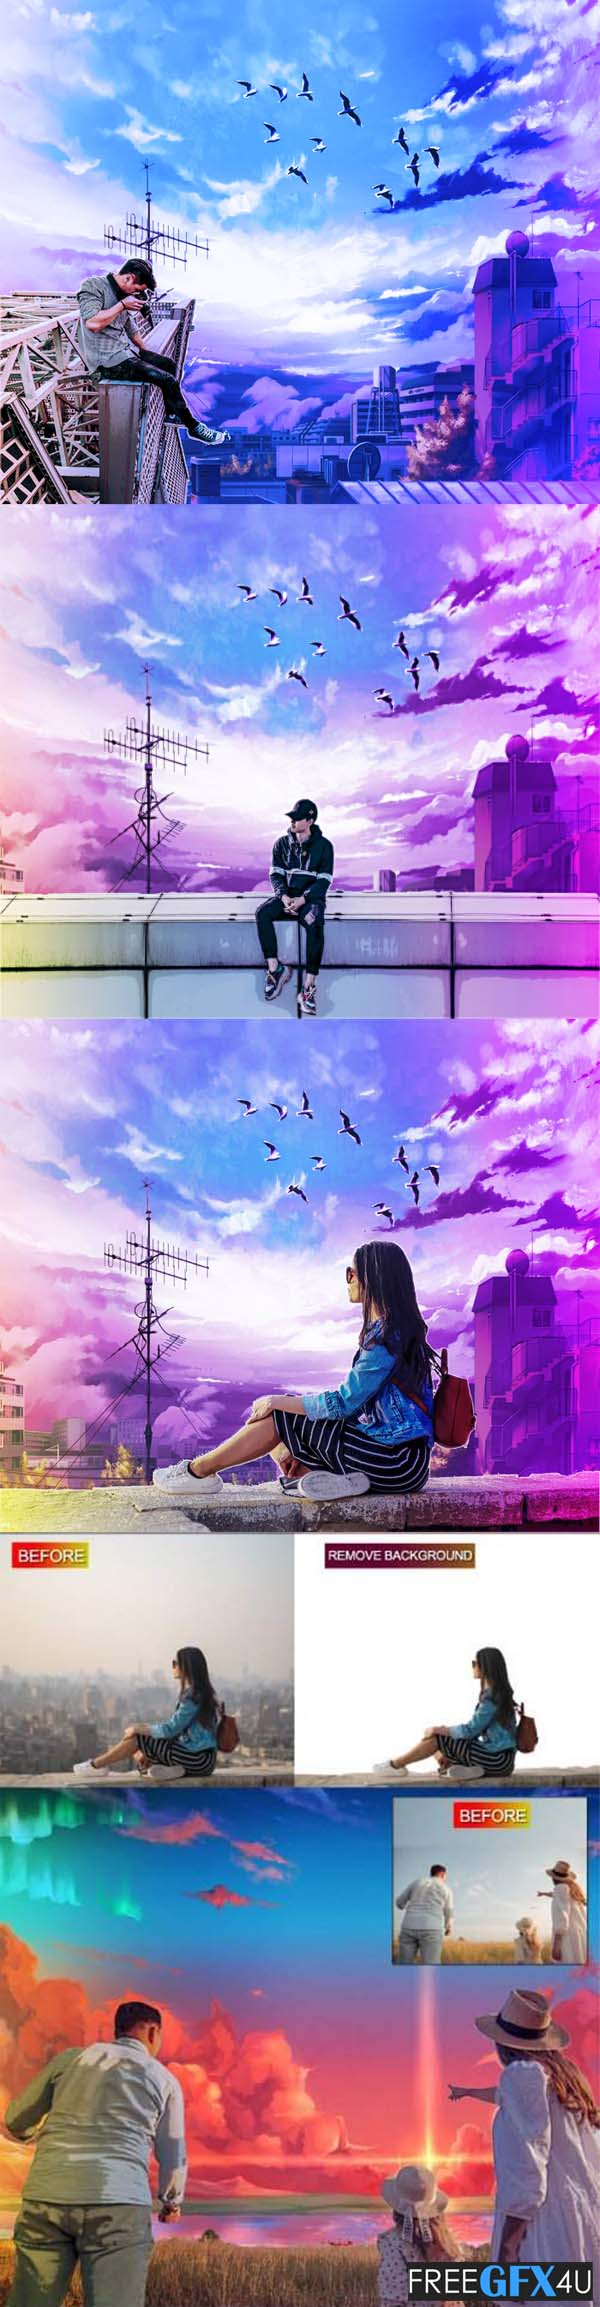 Anime Style Photoshop Action